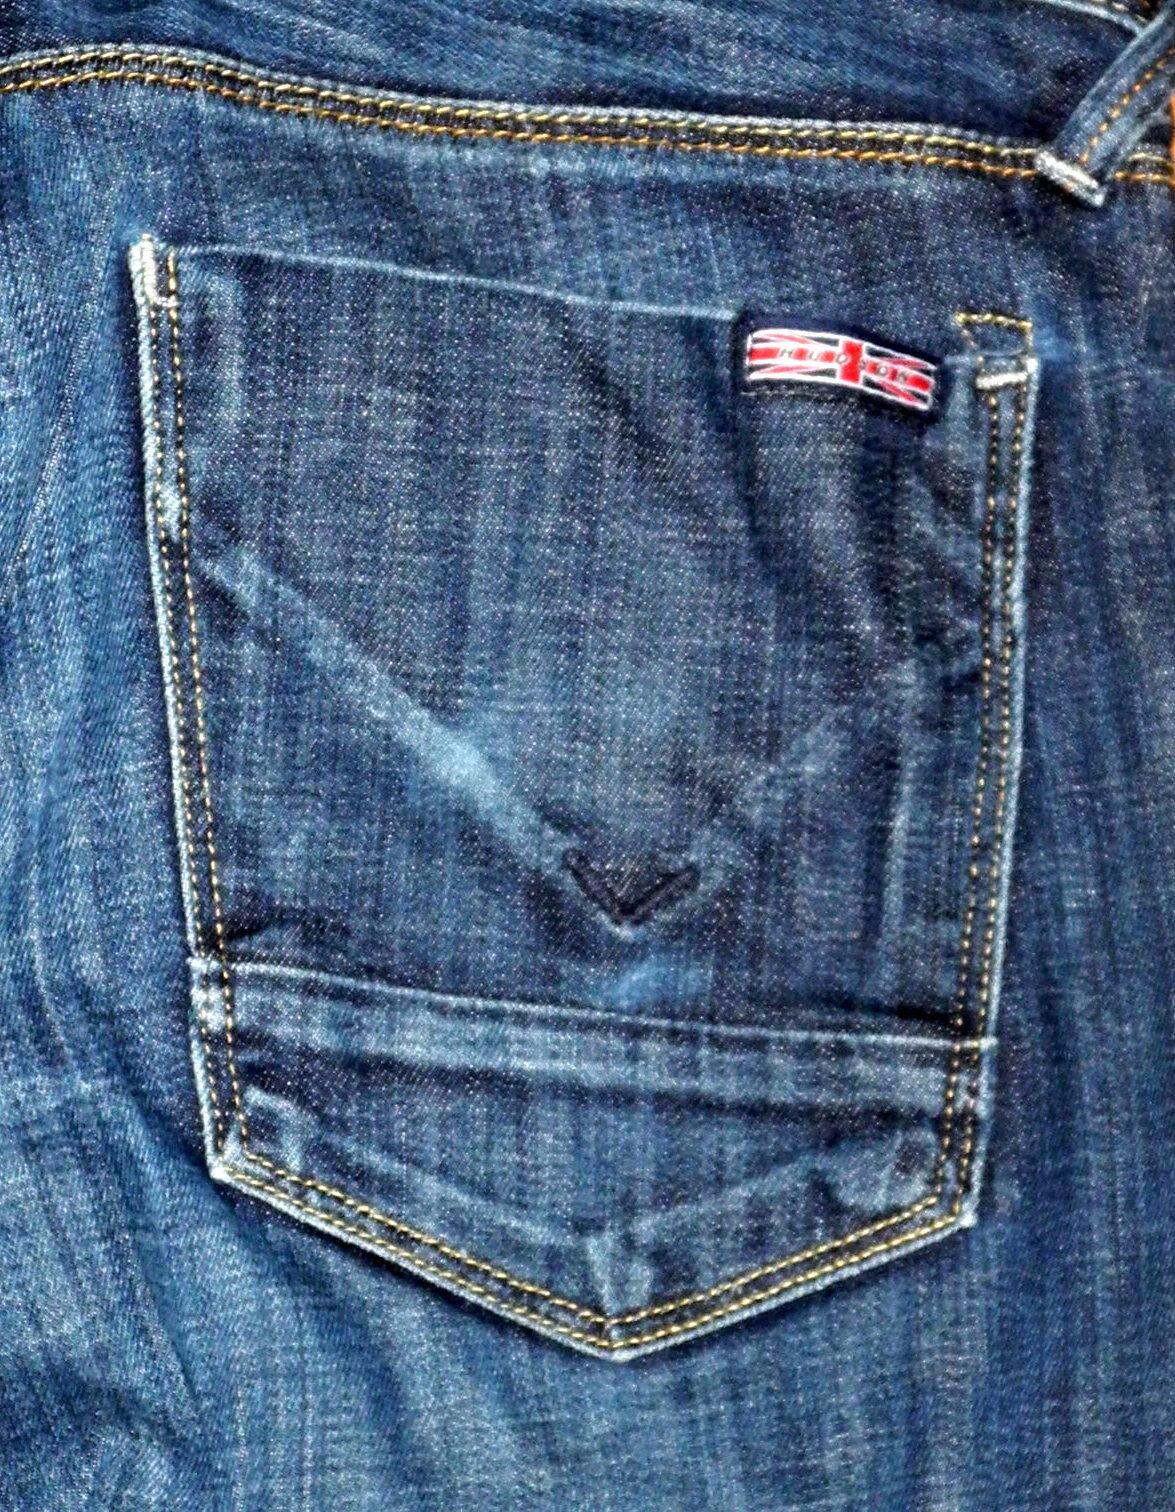 HUDSON Regular Straight Leg Button Fly Men's Dark bluee Stretch Jeans Sz 33x28